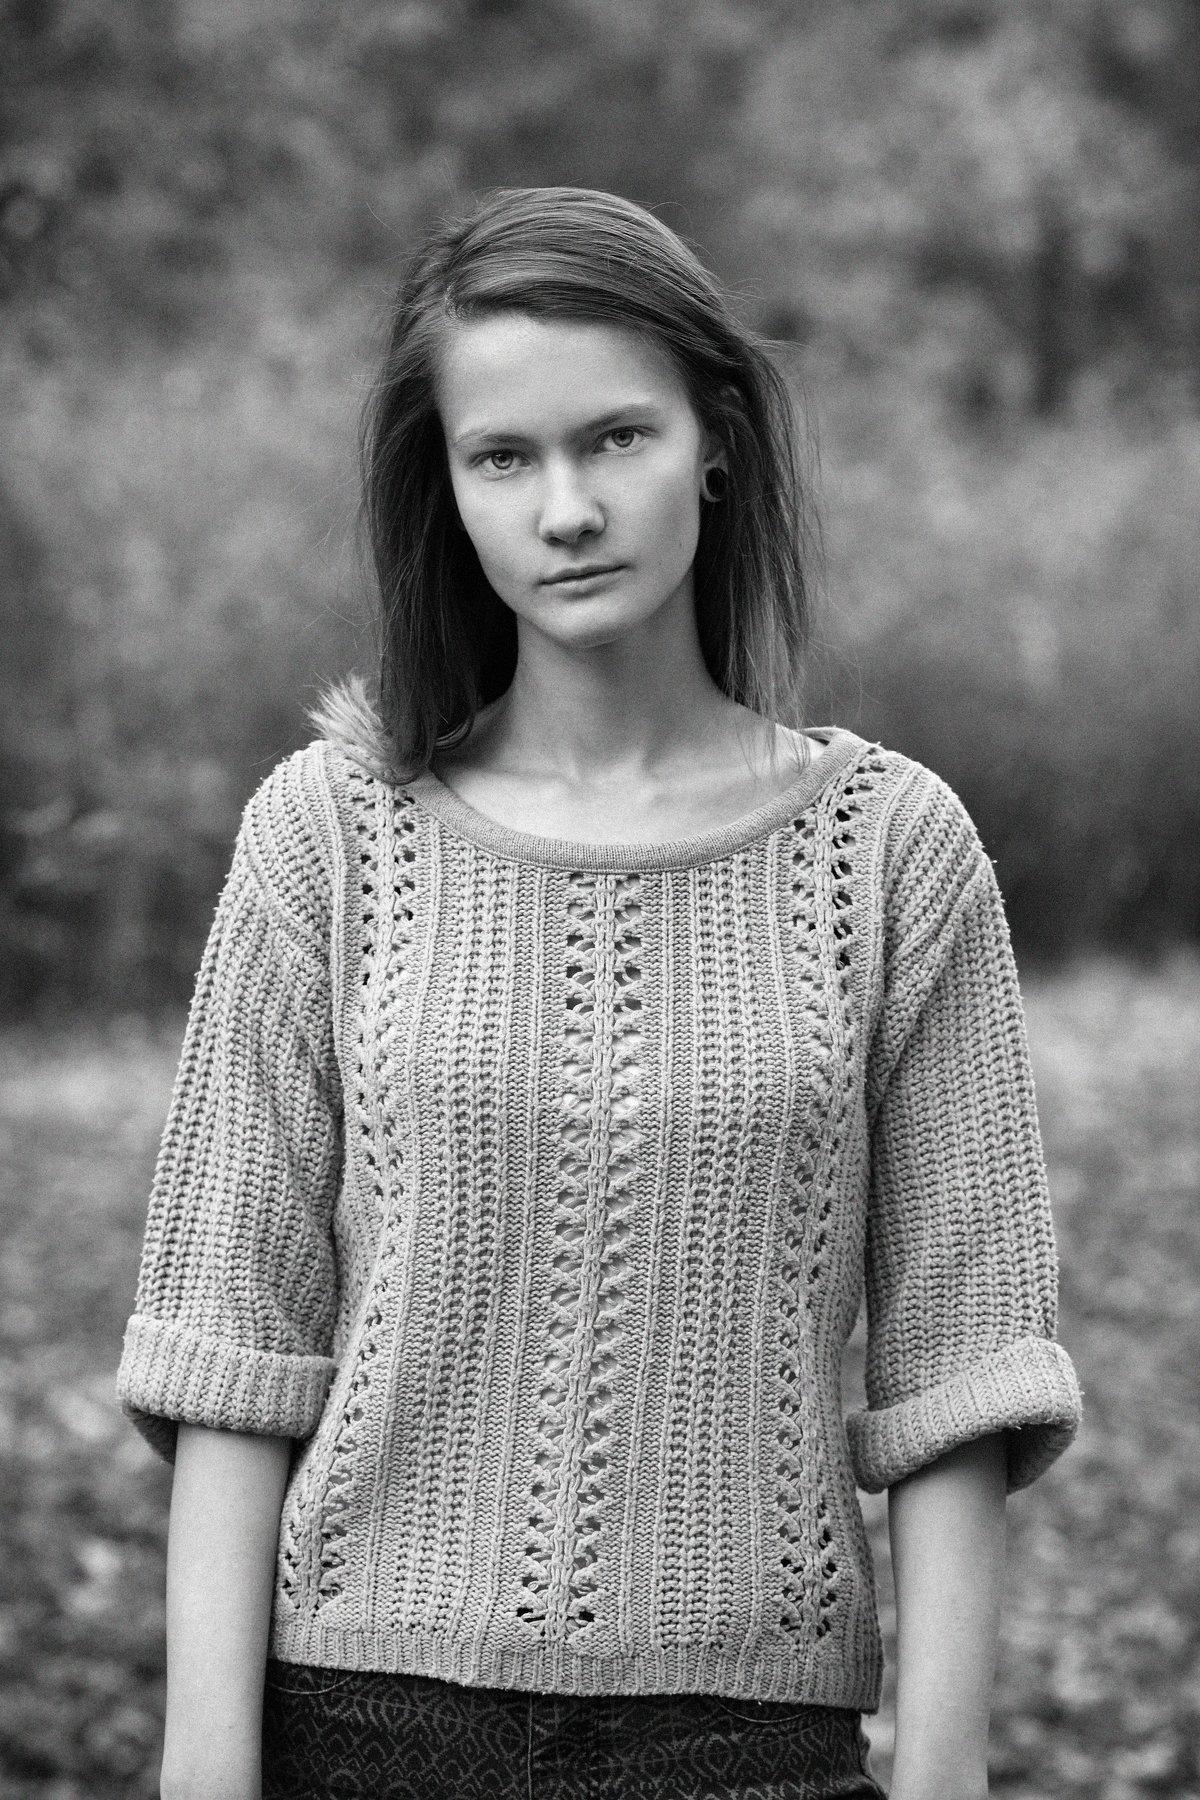 Light, Natural Light , Natural , Black & White , B&W , Model , Pose  , Posing , Asen Andreev , Asen Andreev Photography , Monochrome , Fashion Model , Fashion , Portrait, asen